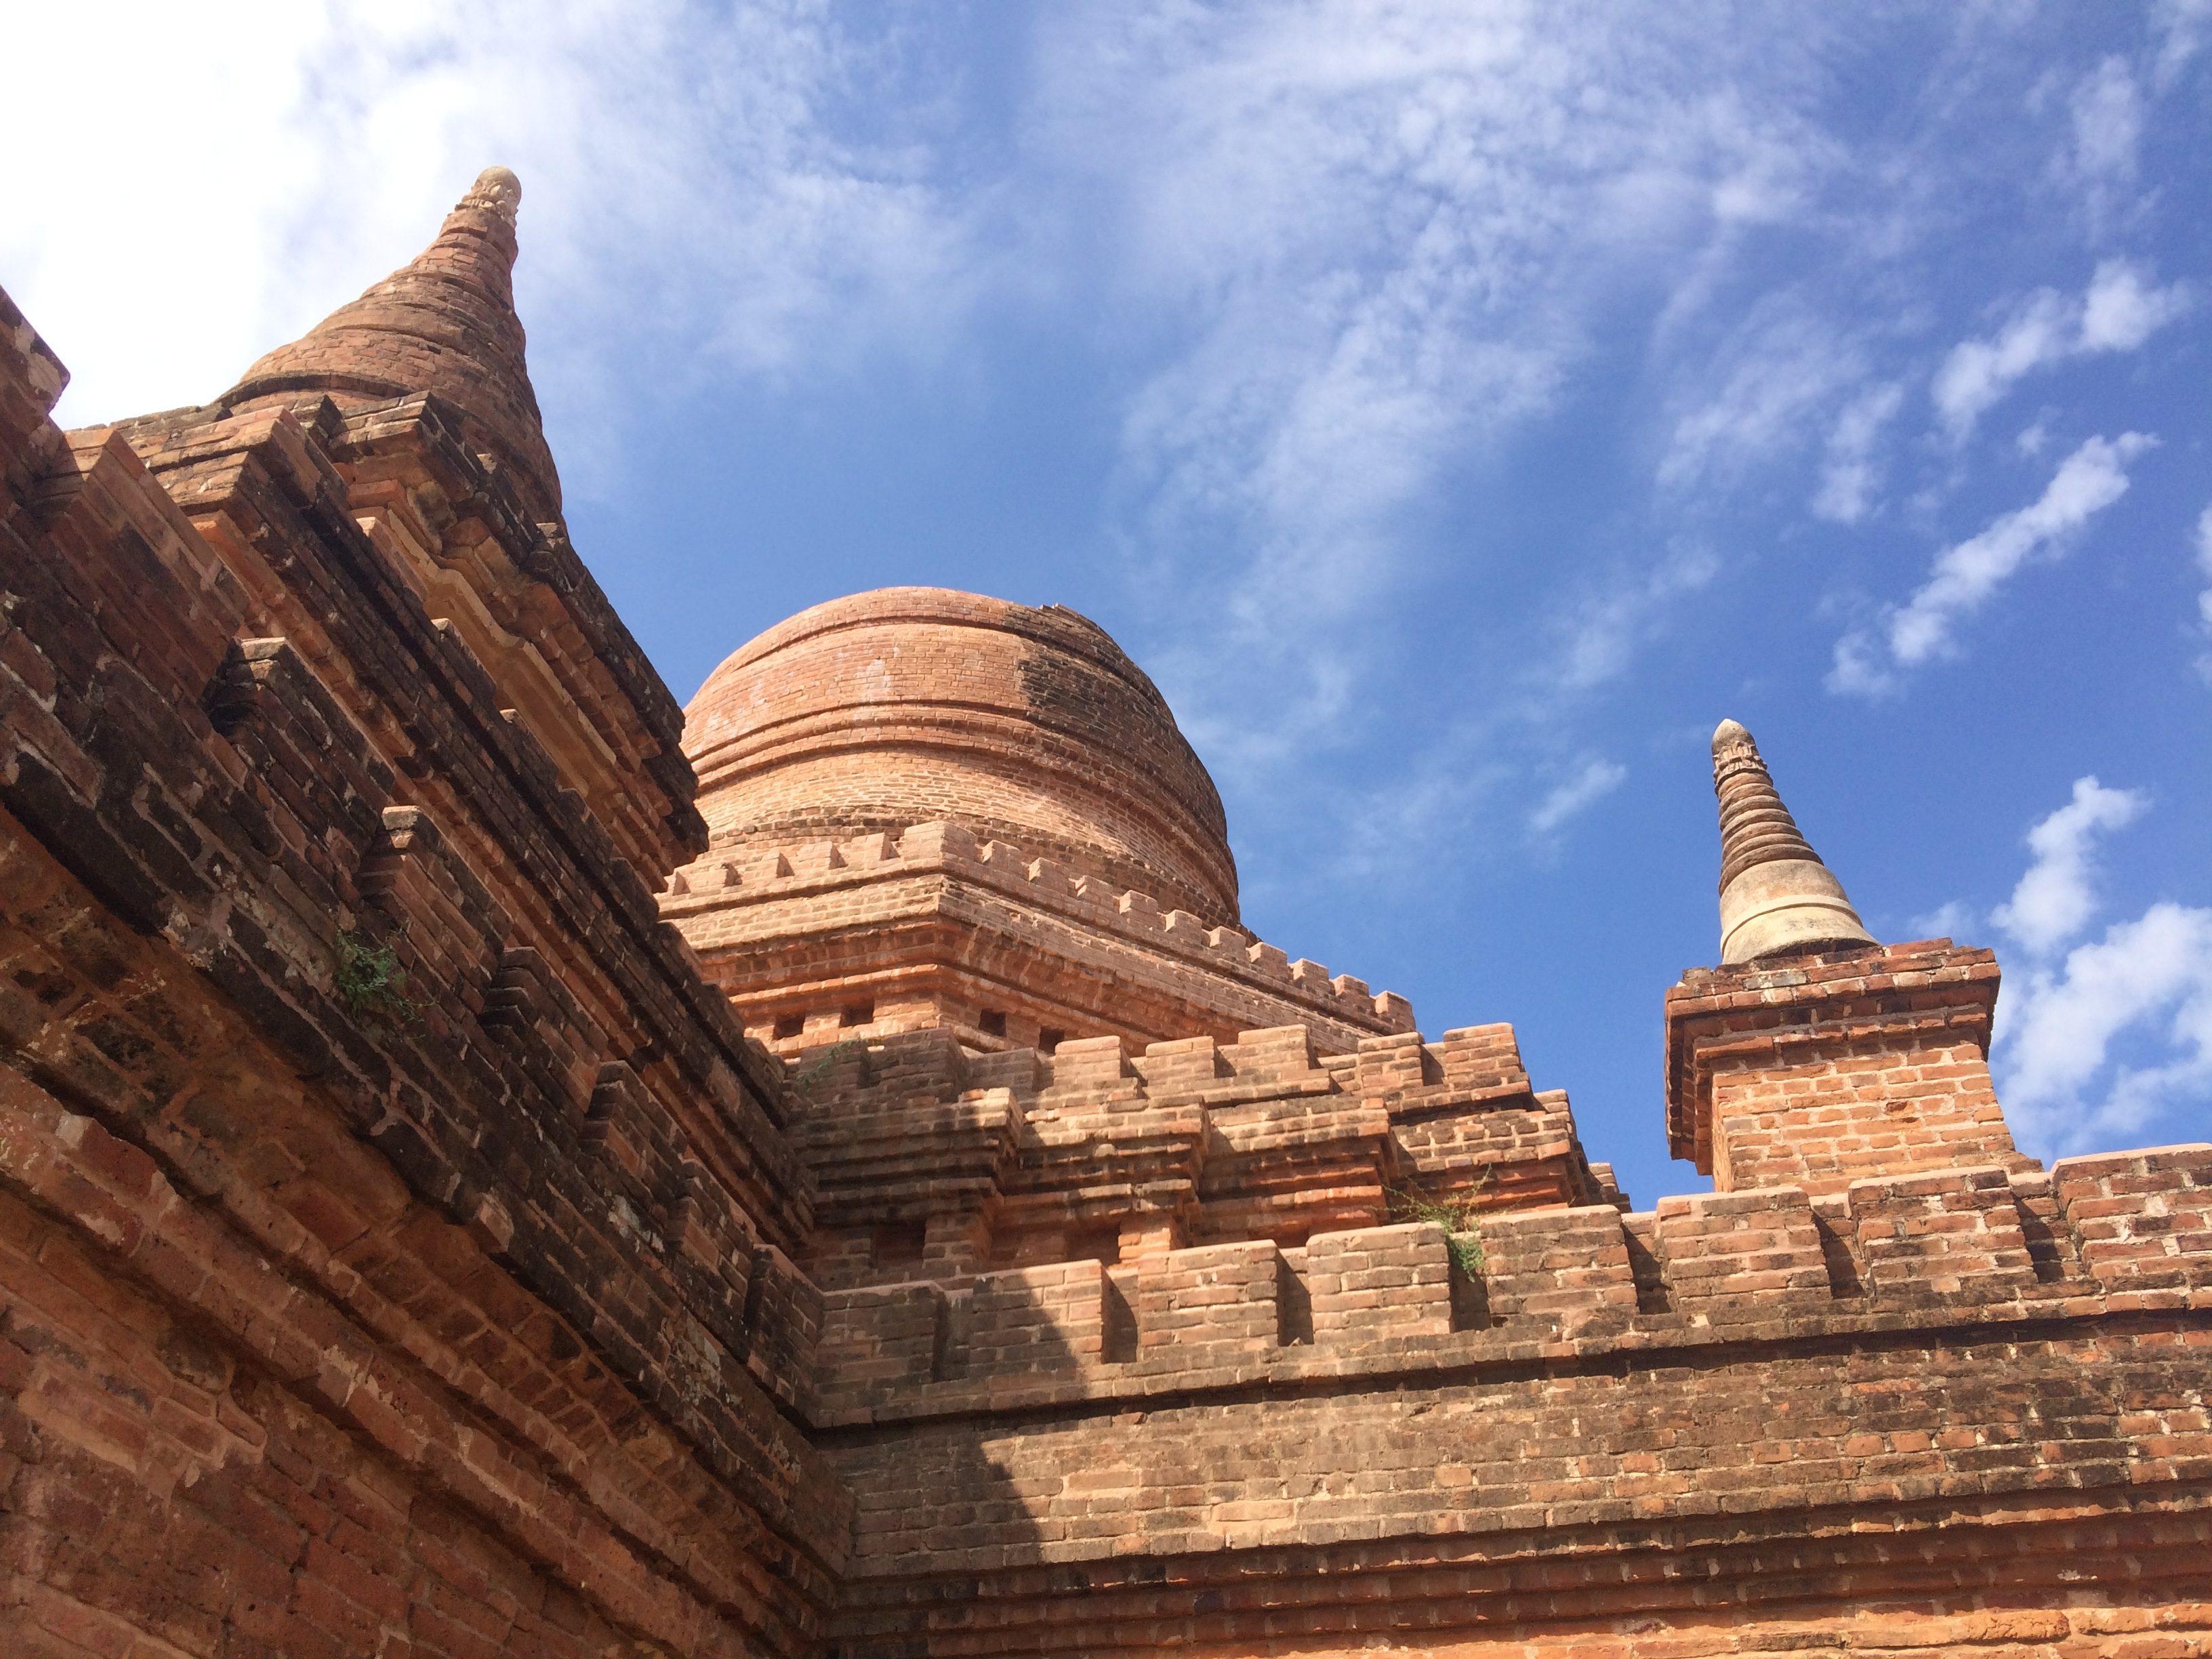 Ein Tempel Bagans